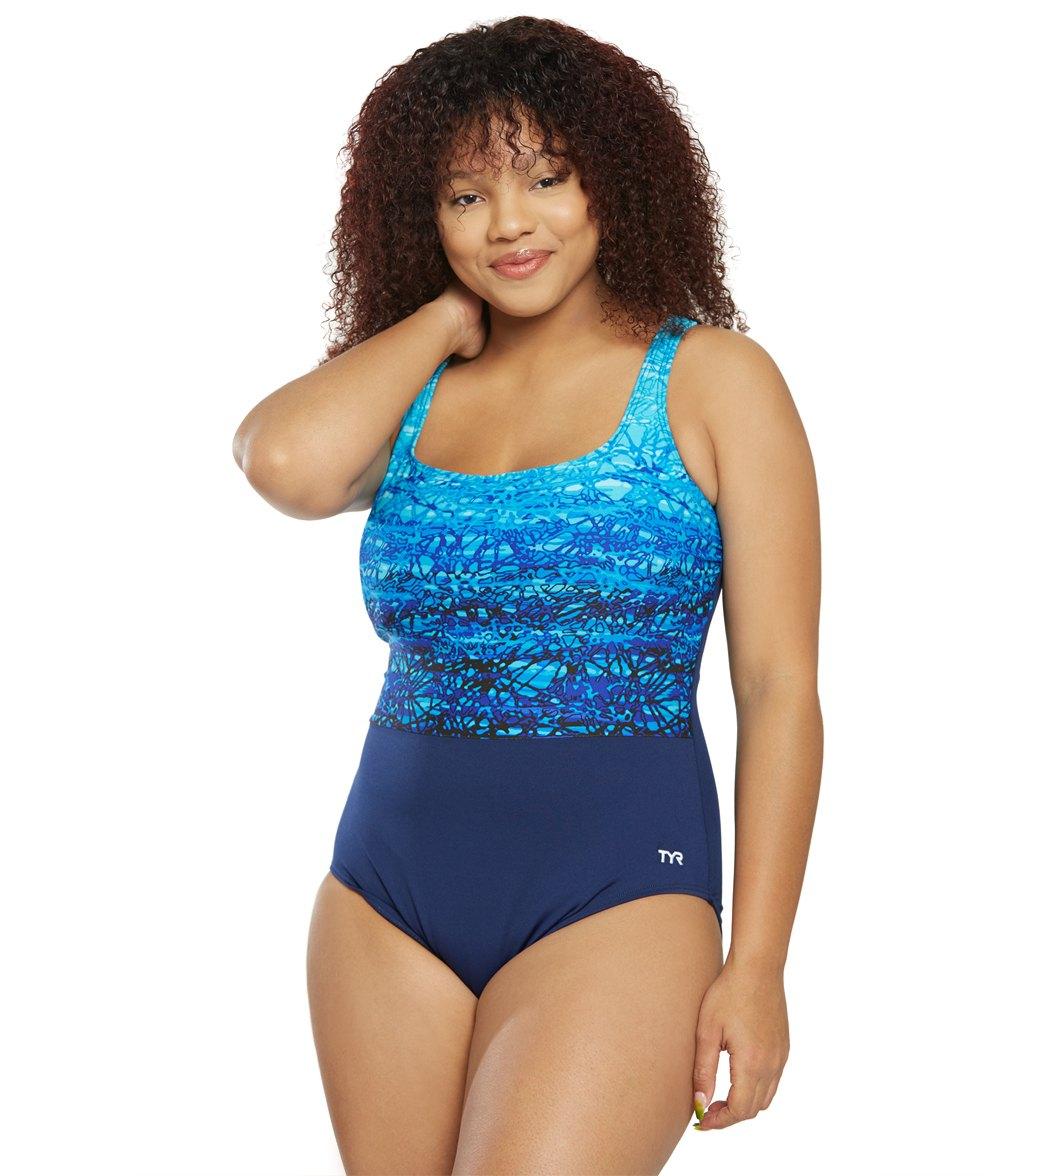 63508b981ce TYR Women's Plus Size Arctic Scoop Neck Controlfit Chlorine Resistant One  Piece Swimsuit